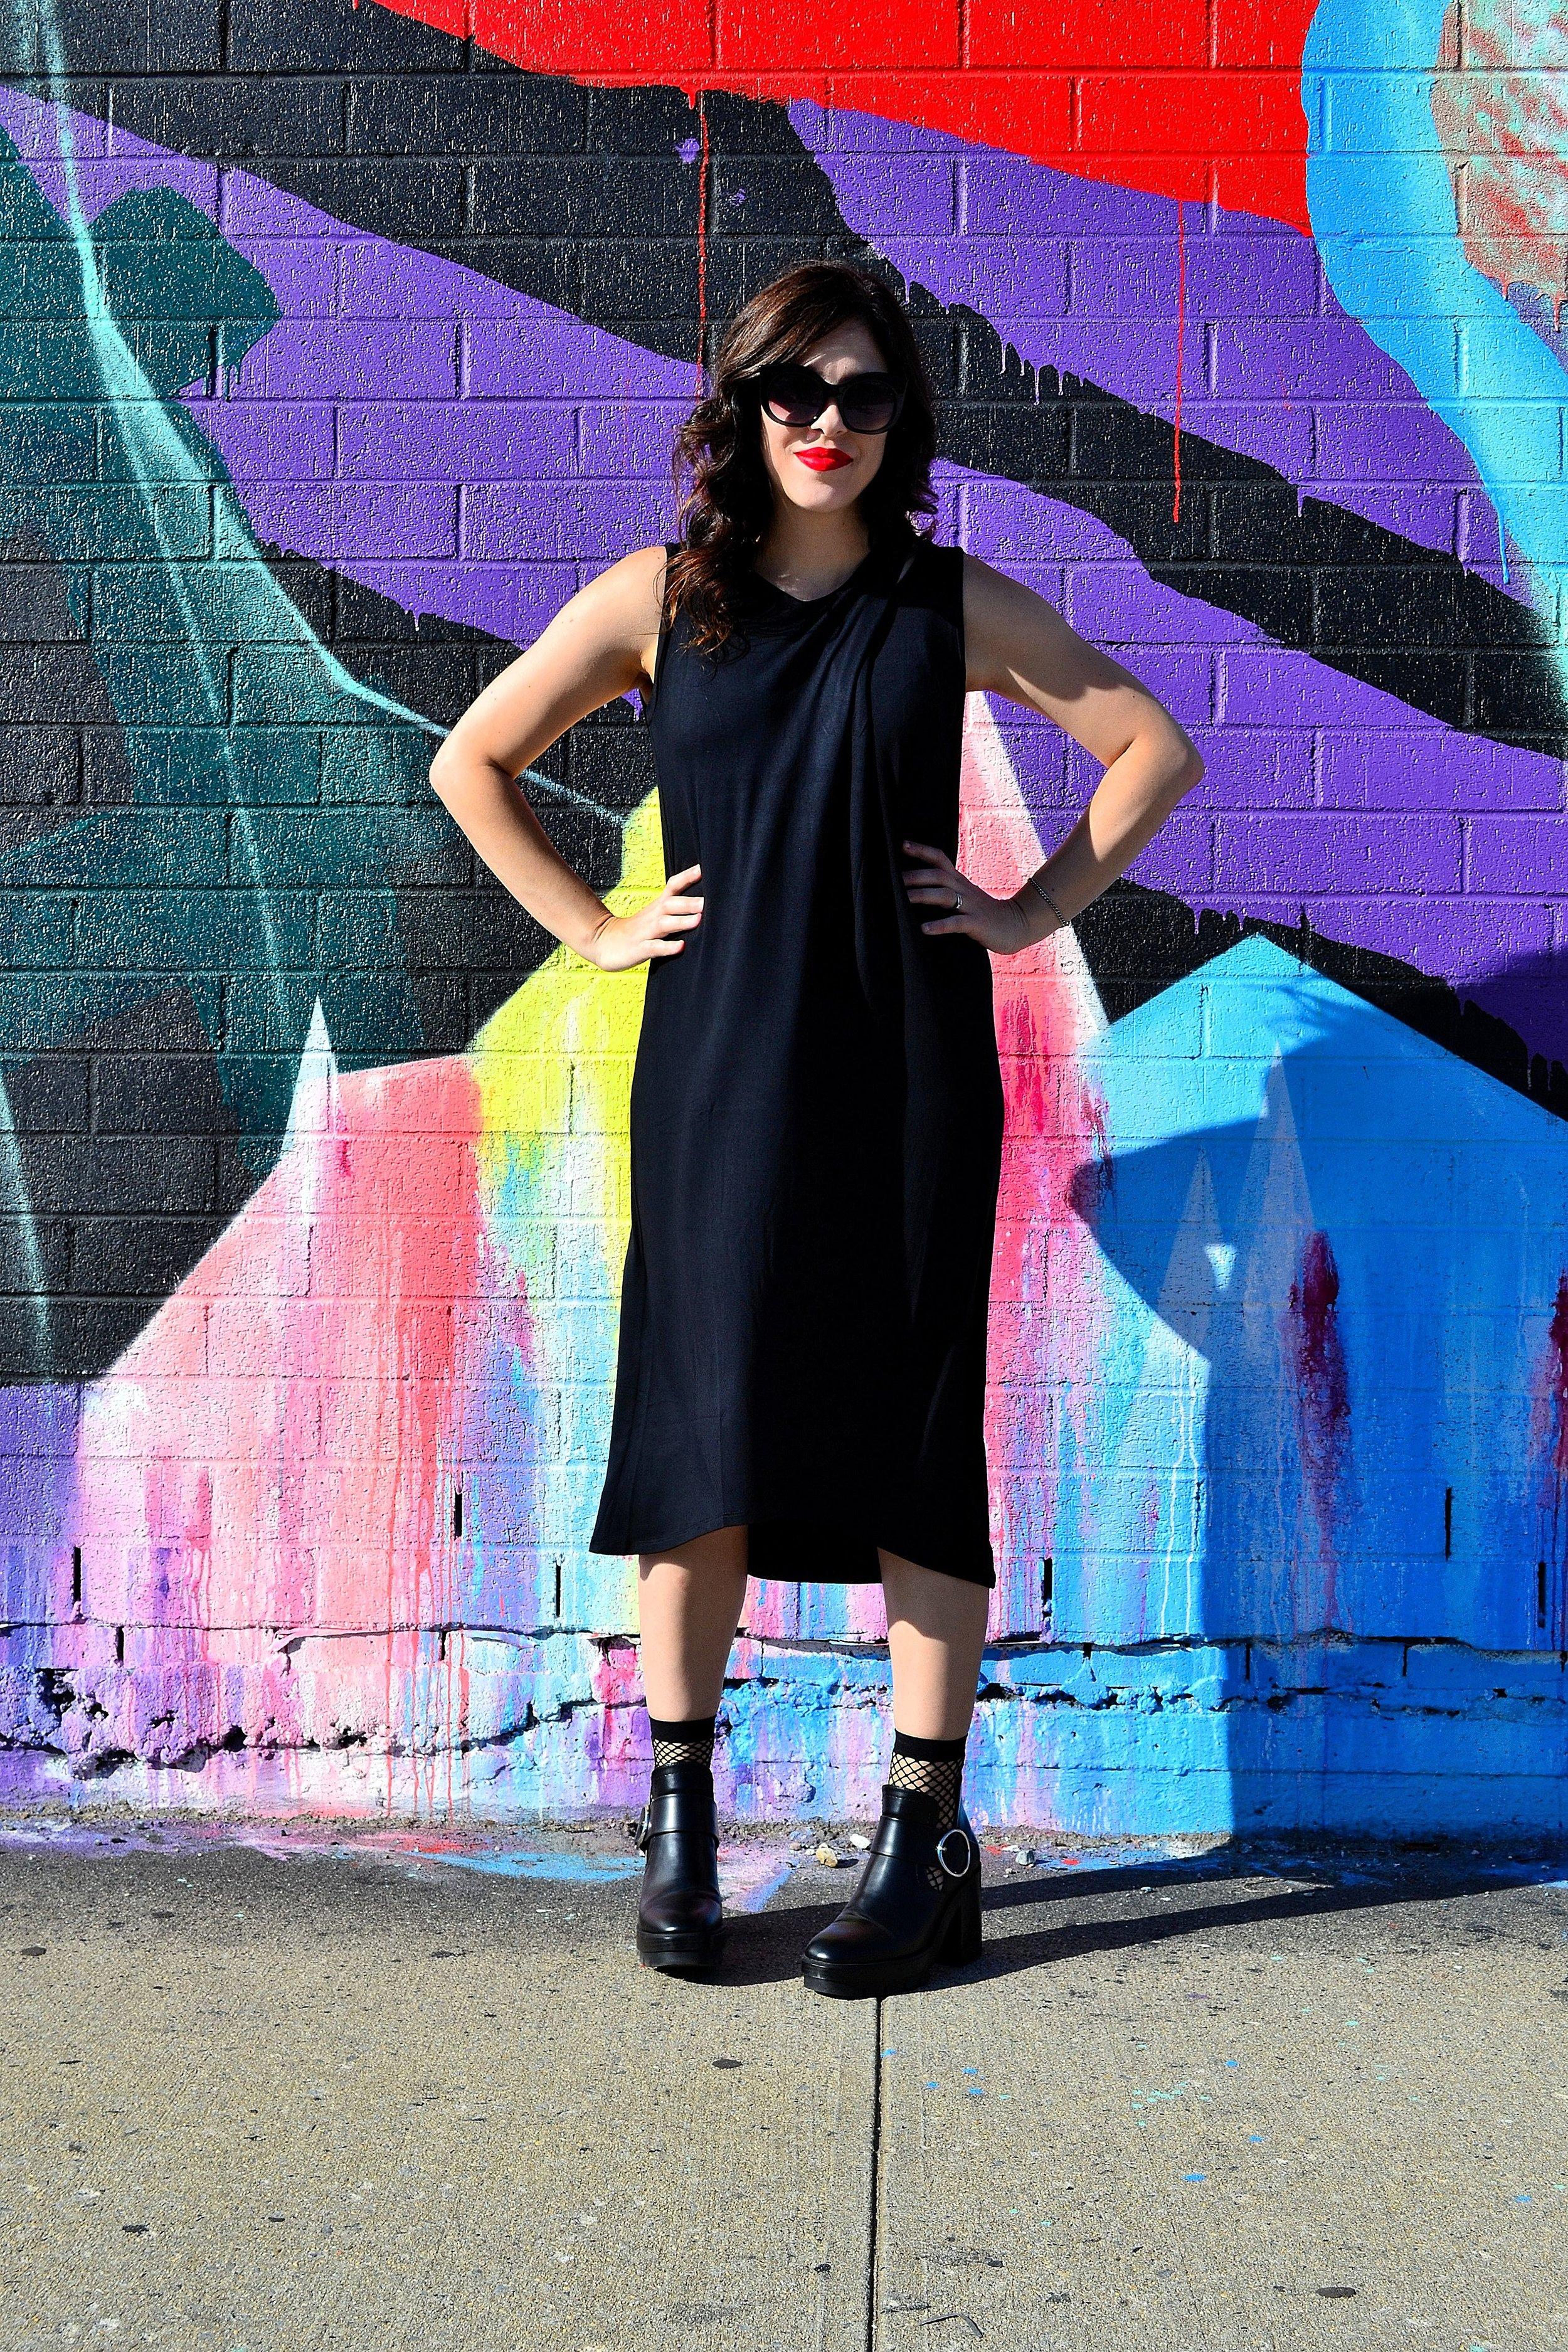 Bar III dress ASOS fishnet socks Zara booties3.JPG